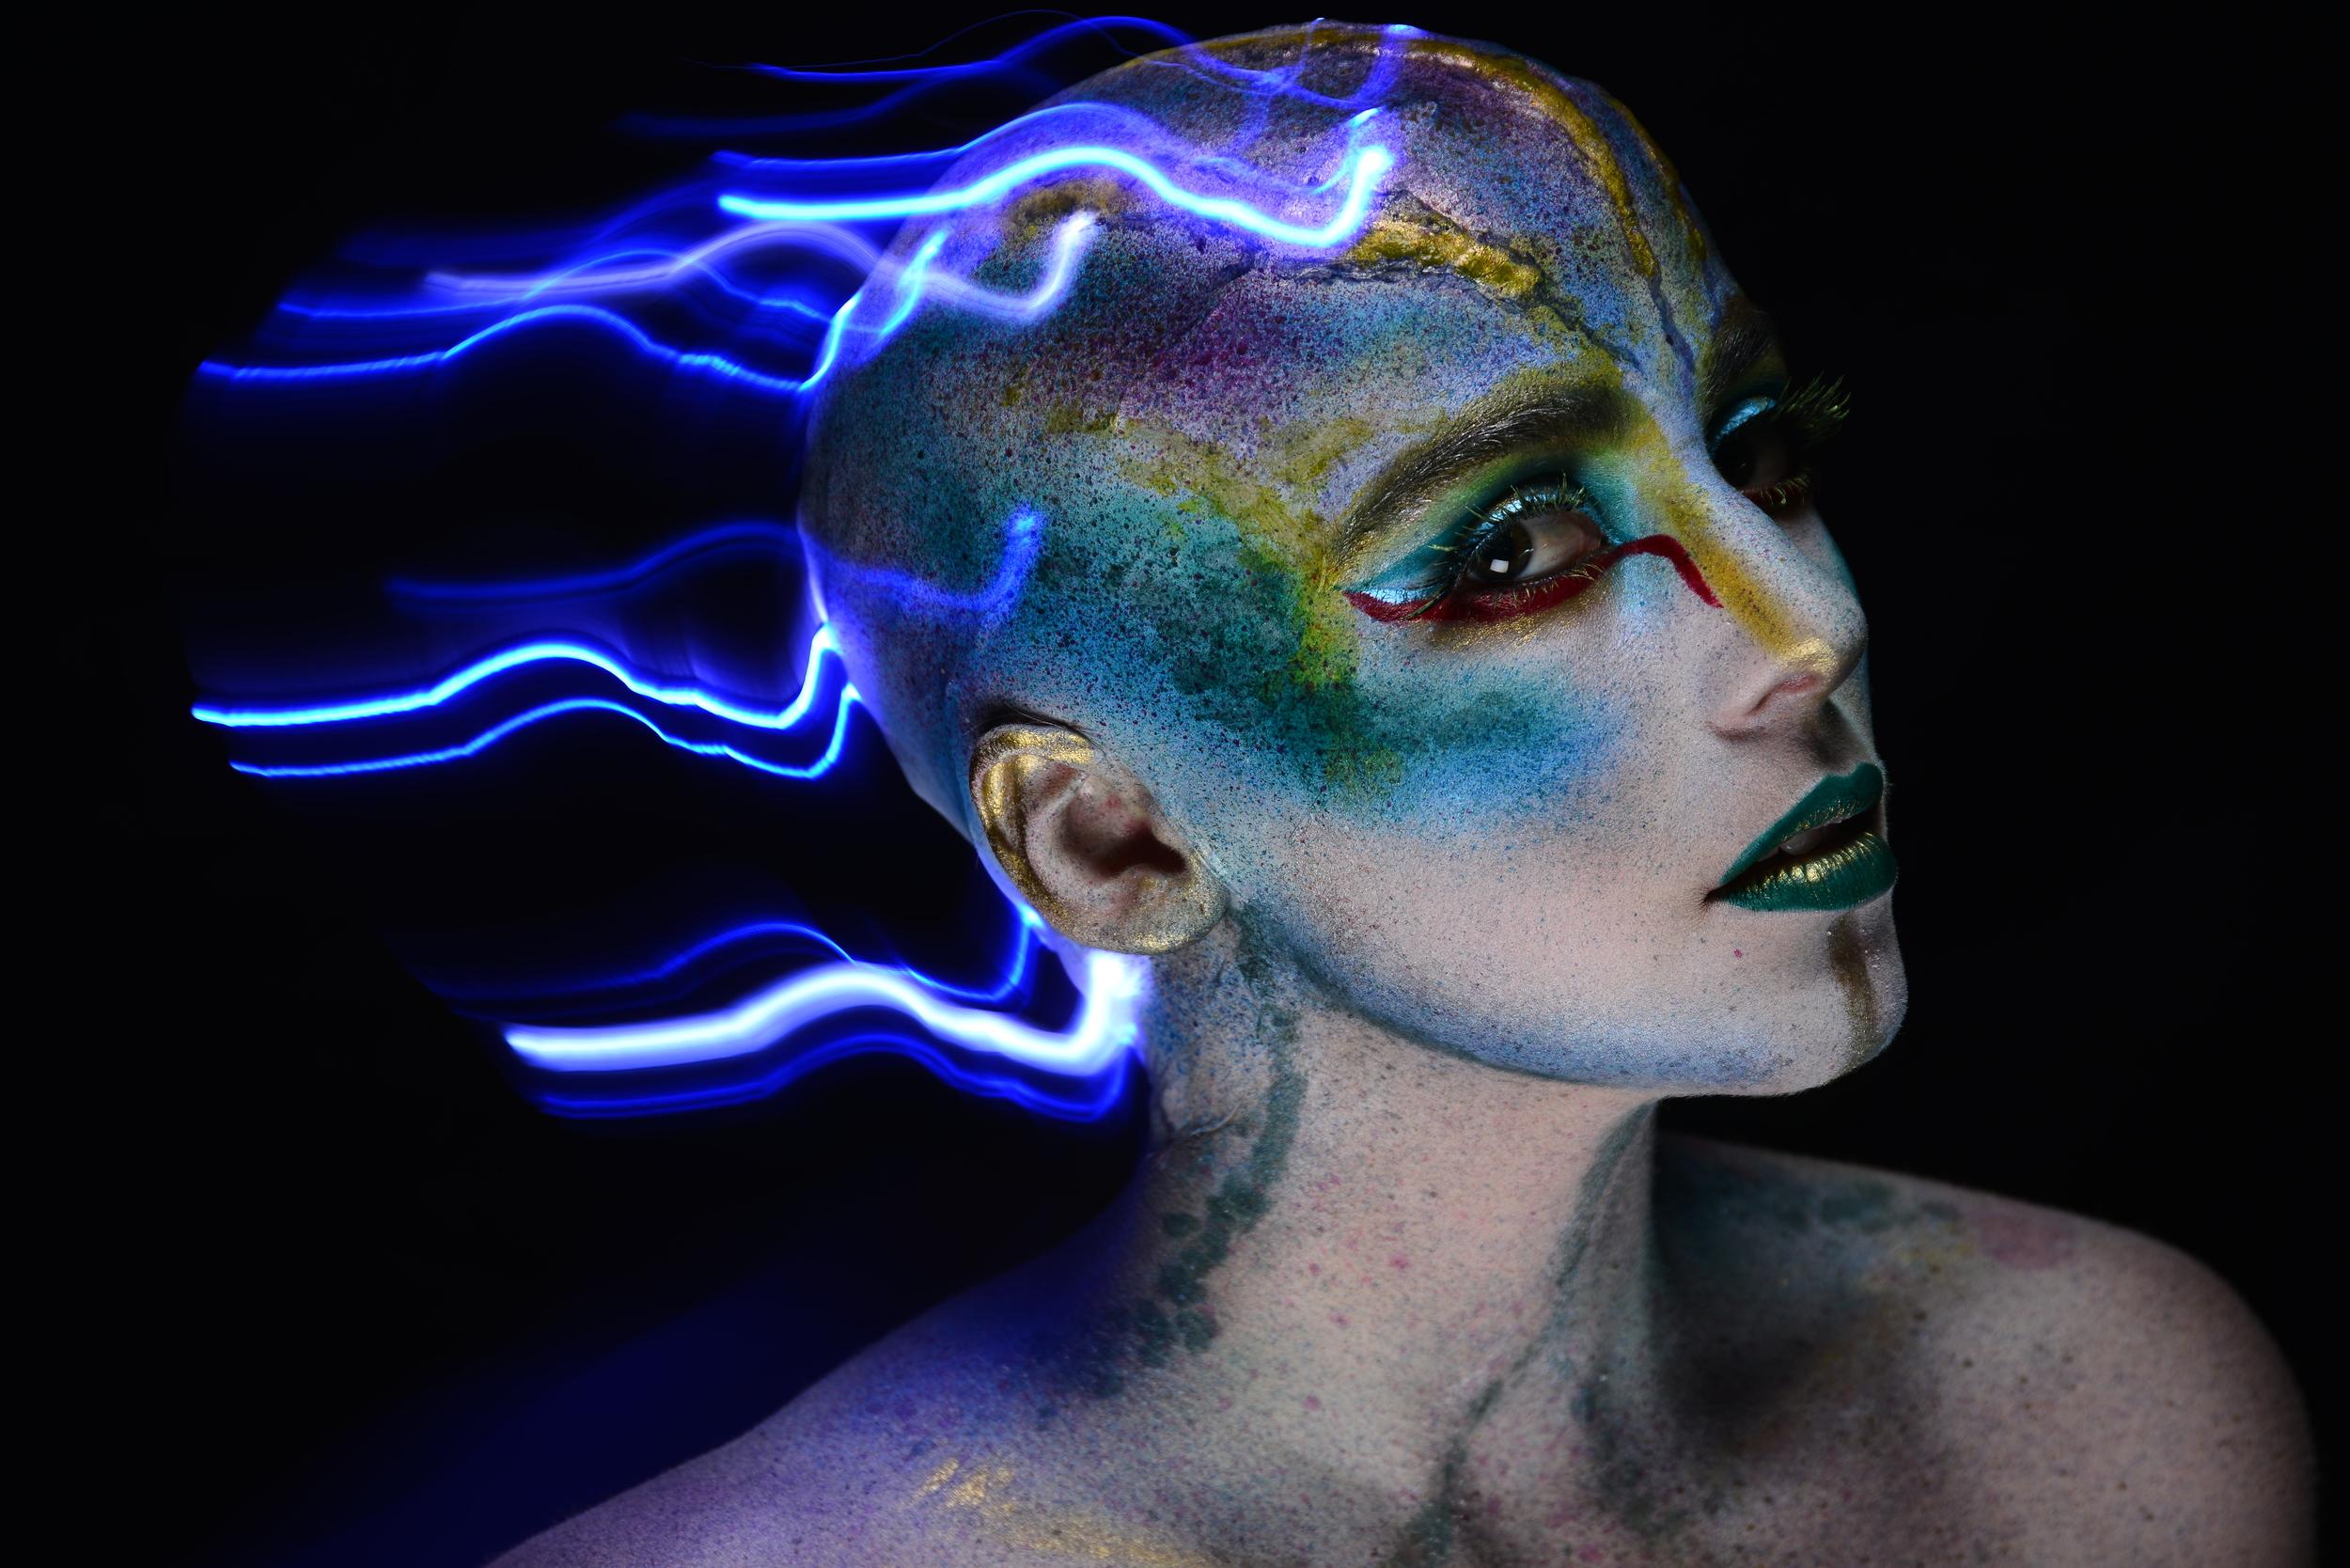 Model: Tash Kouri  Photographer: Last Witness